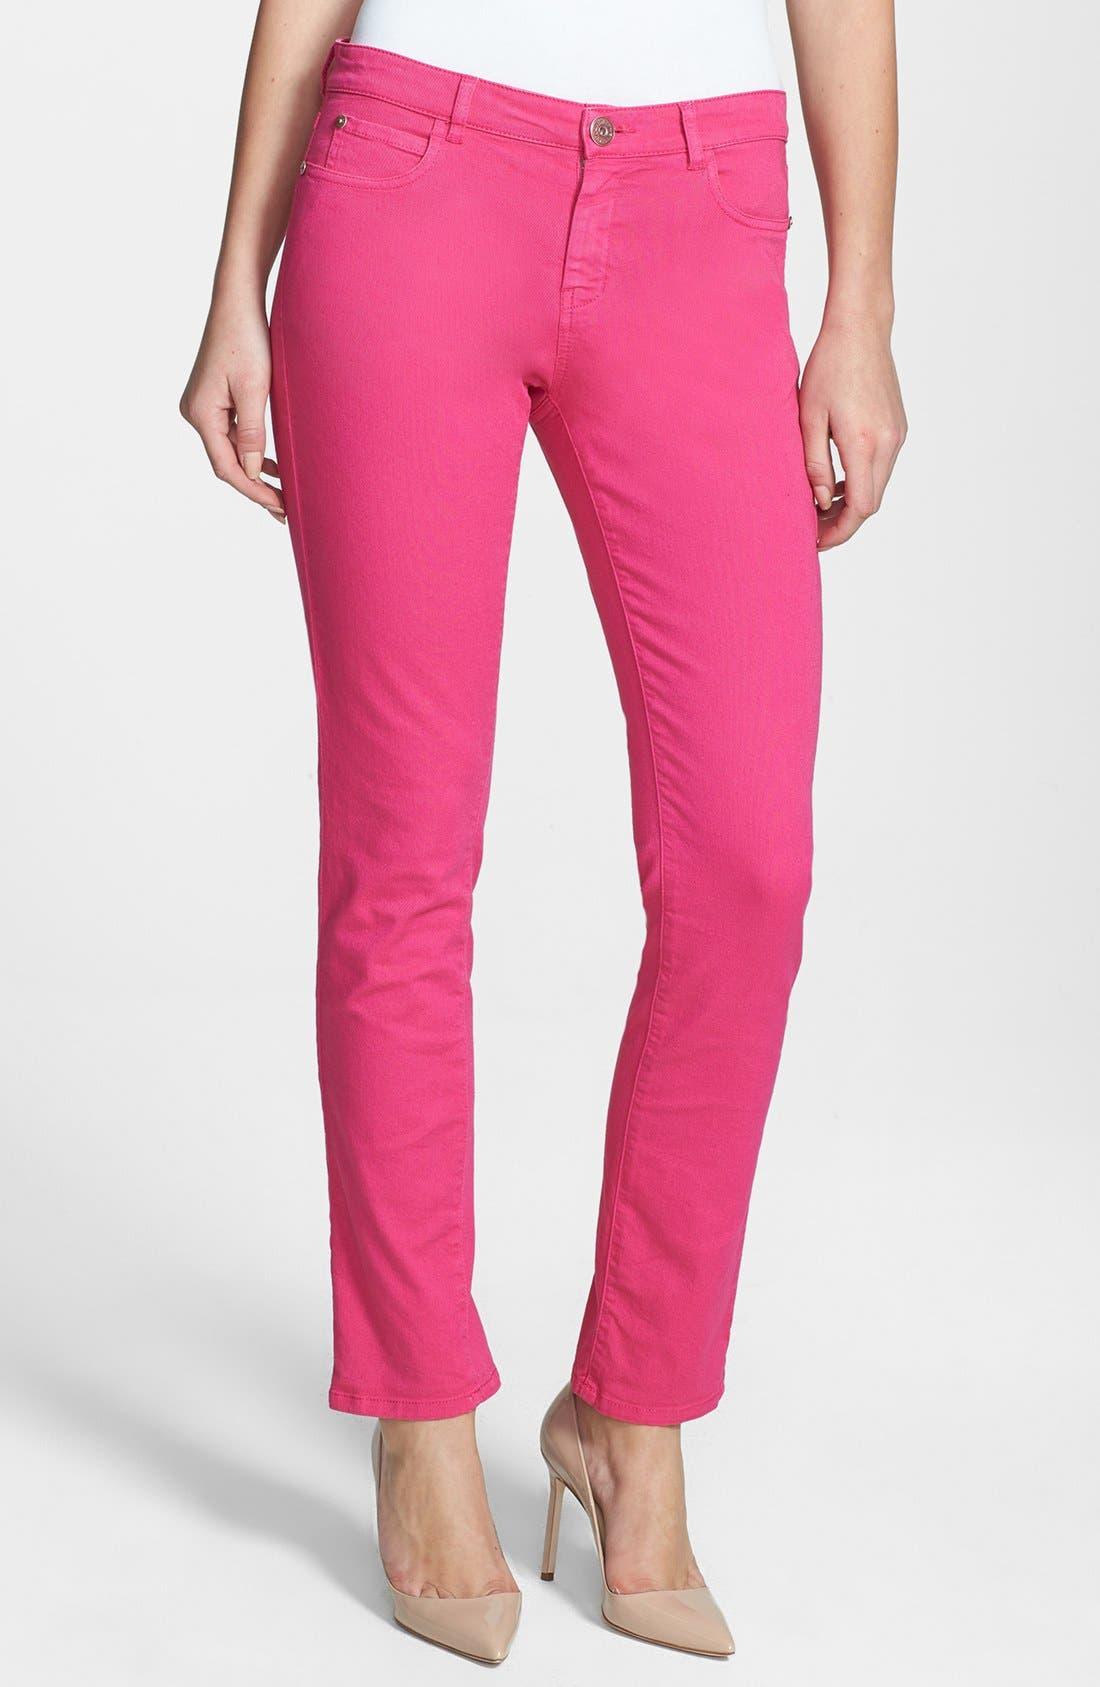 Alternate Image 1 Selected - Weekend Max Mara 'Gitano' Stretch Cotton Pants